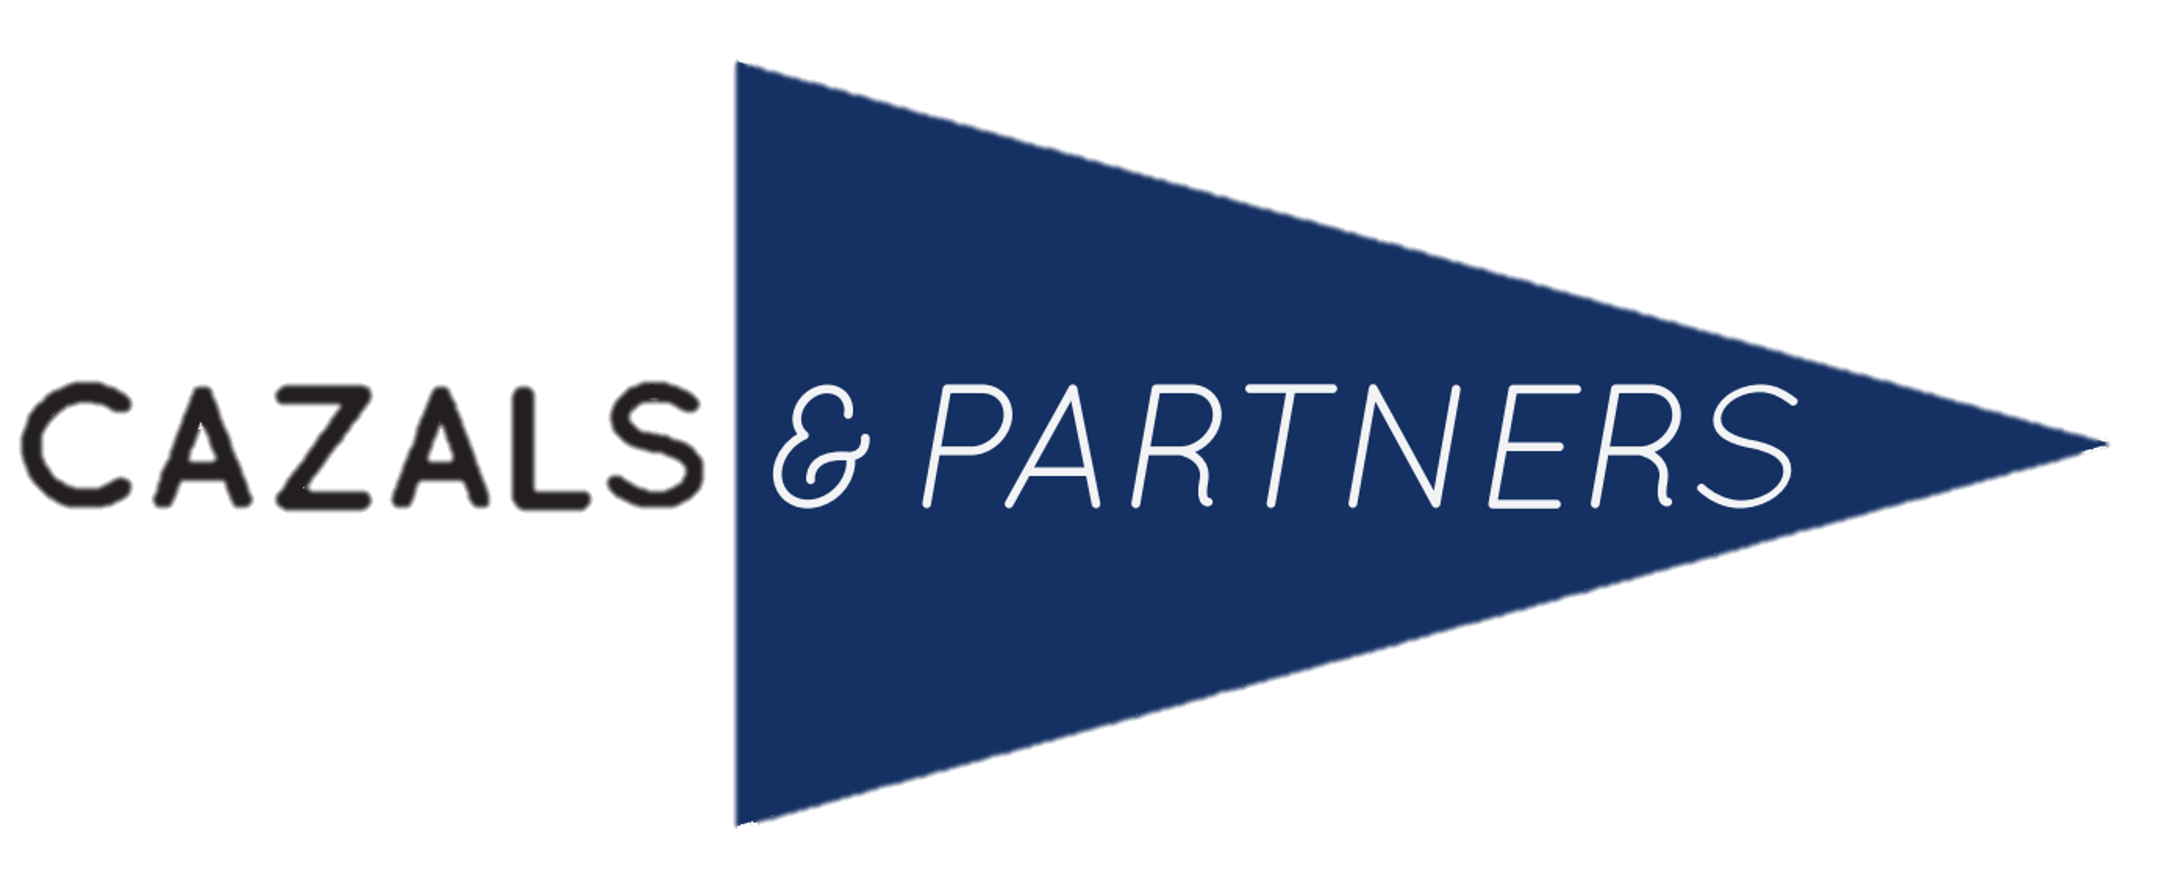 Cazals & Partners